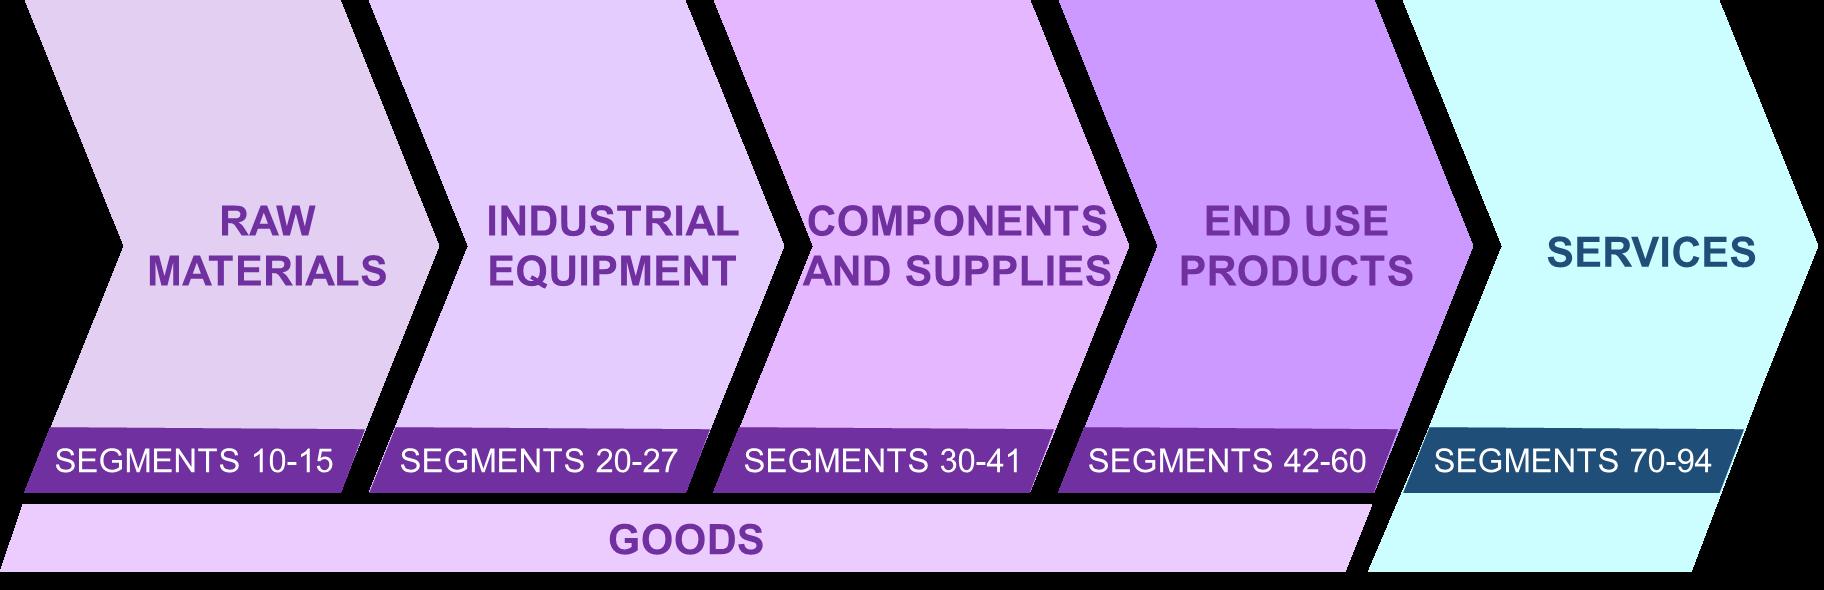 UNSPSC Segment Organization